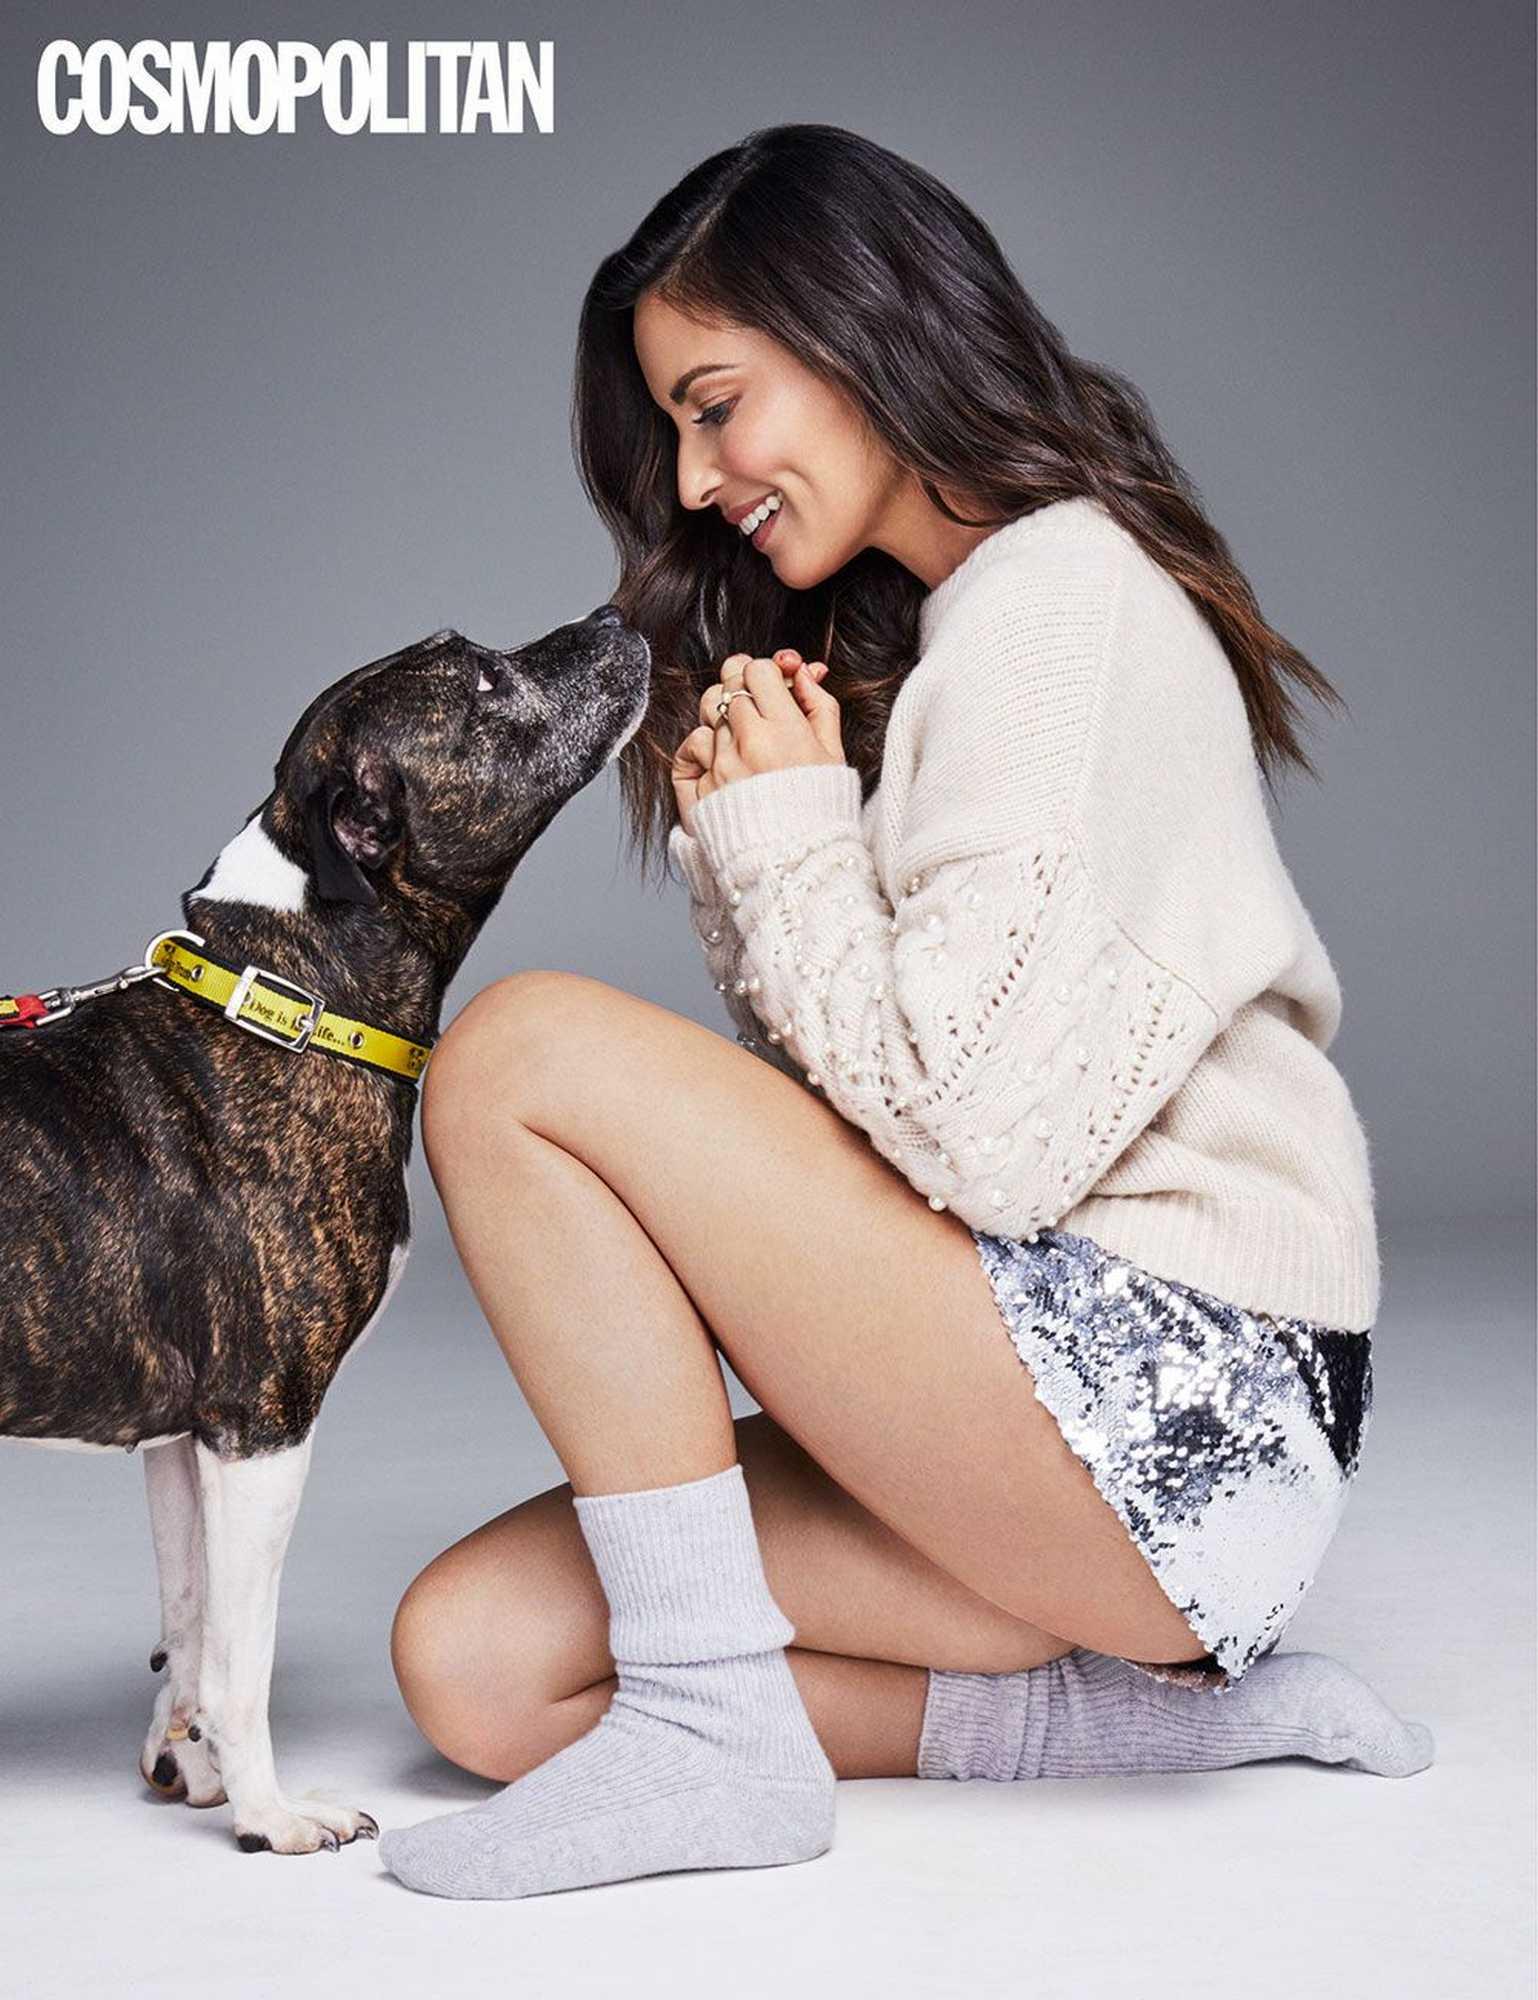 Olivia-Munn-Cosmopolitan-UK-December-201857979b1013963294.jpg